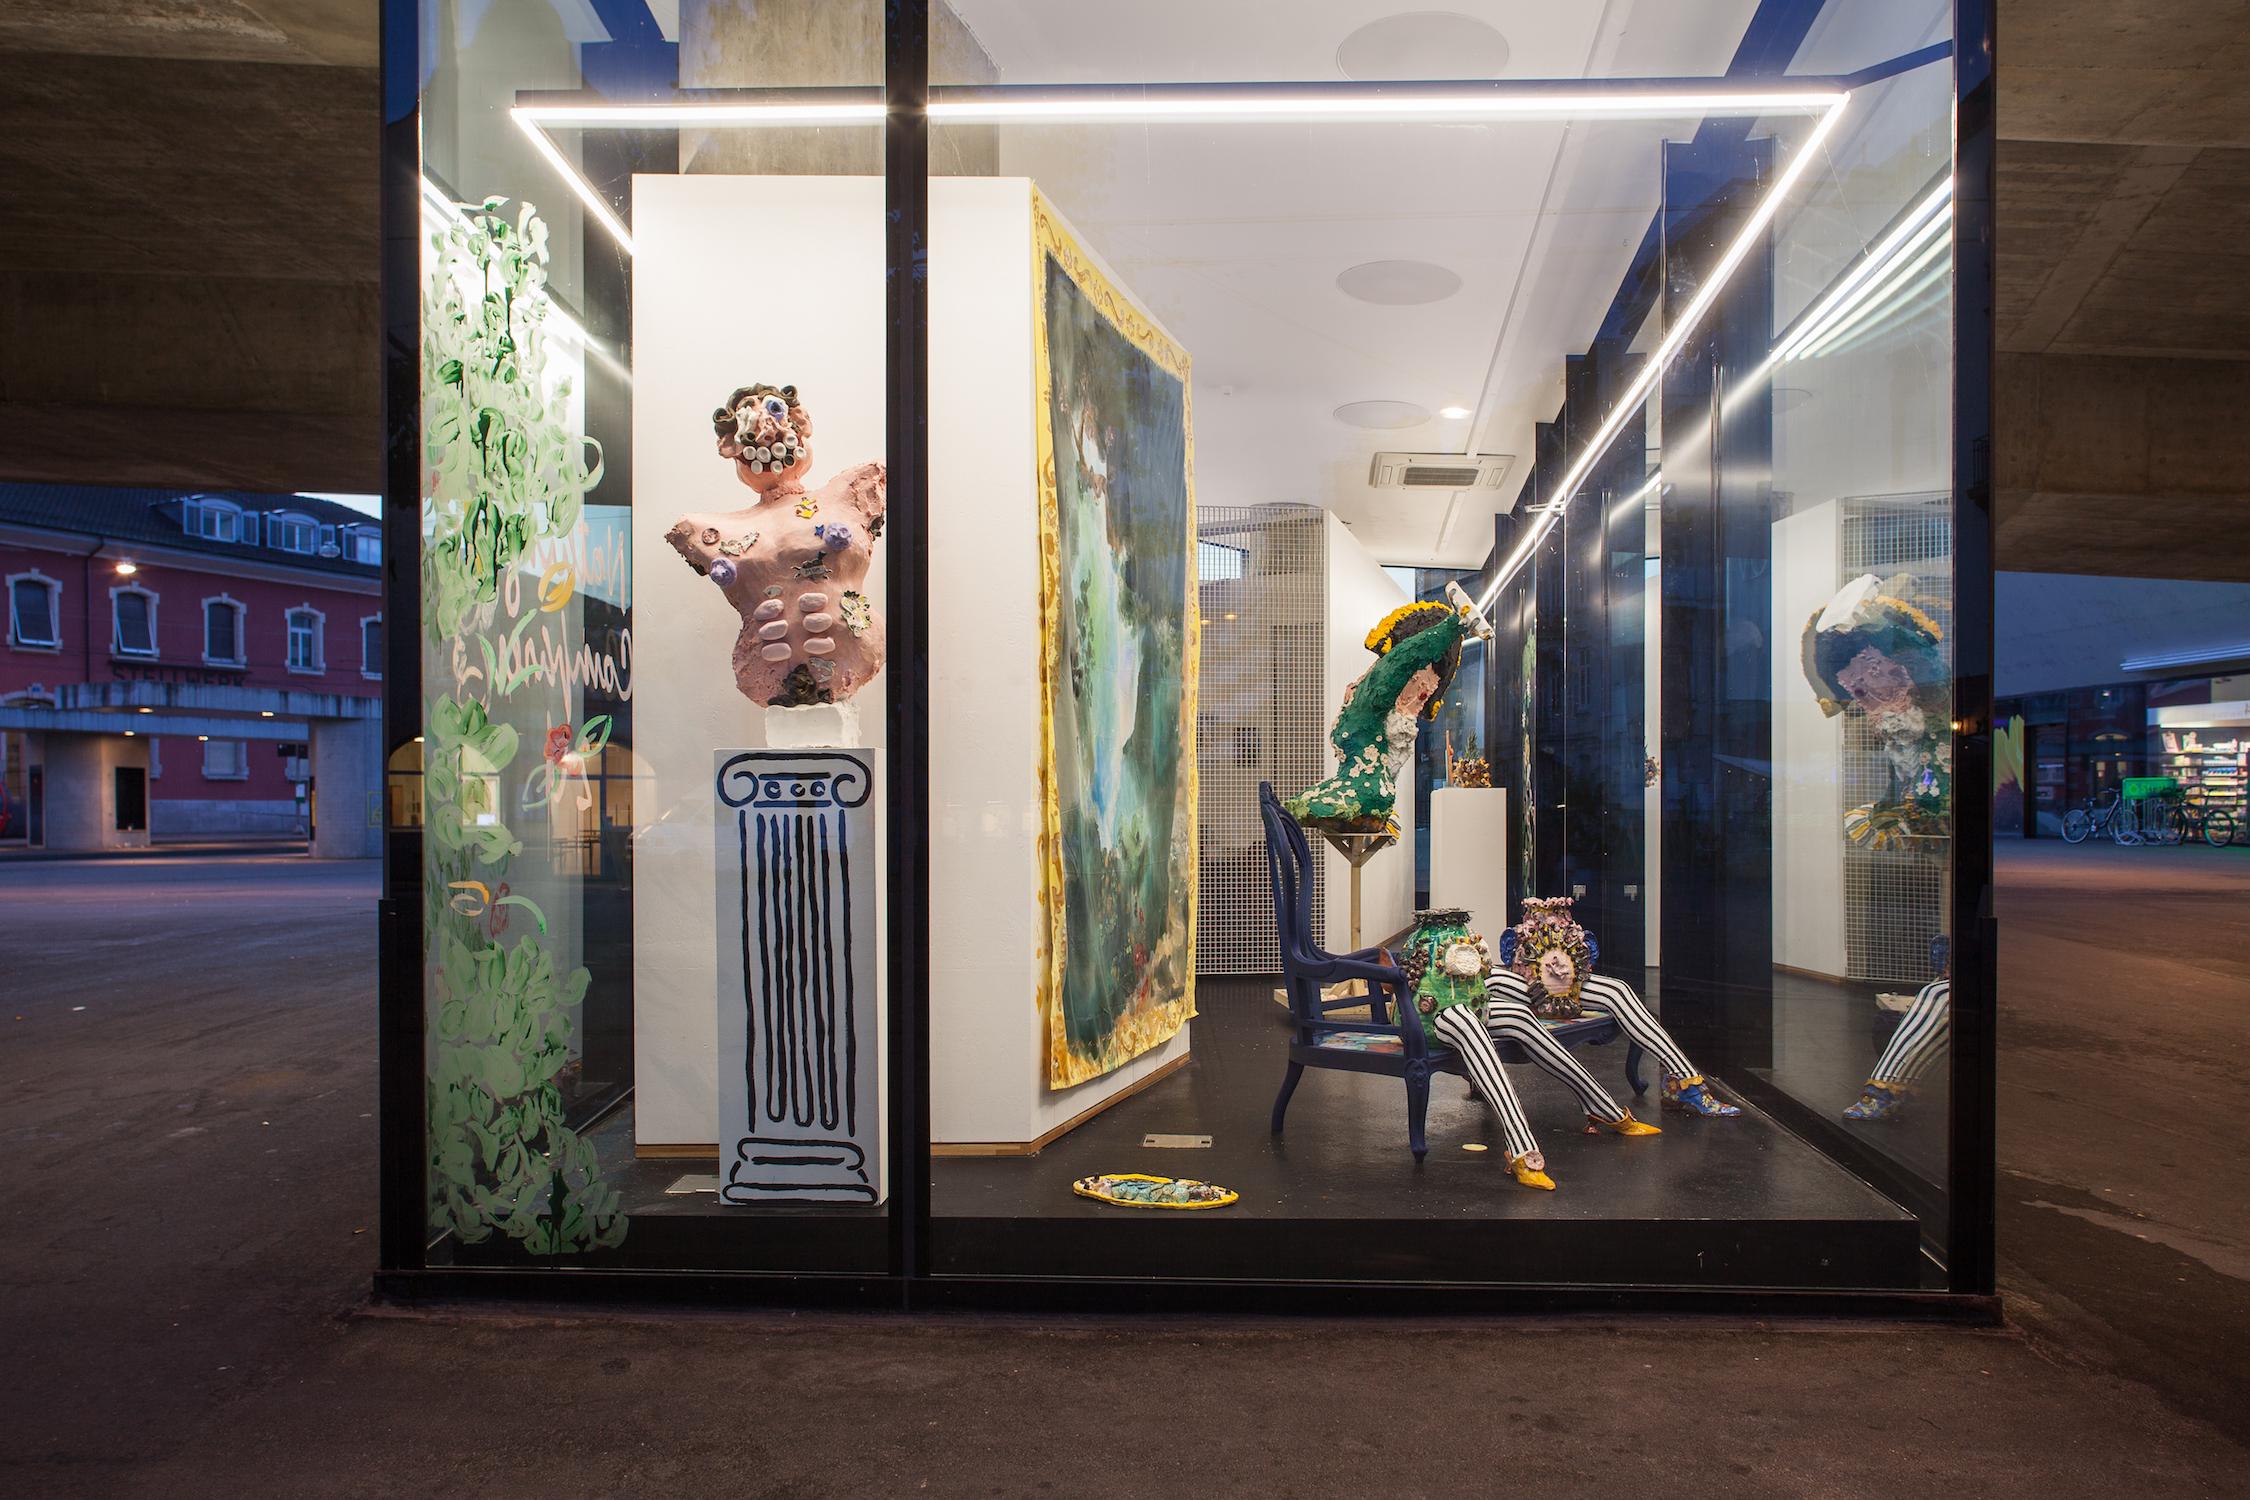 Jamie Fitzpatrick & Lindsey Mendick, SMUT, 2018. Installation view. VITRINE, Basel. Photographer: Nicolas Gysin.